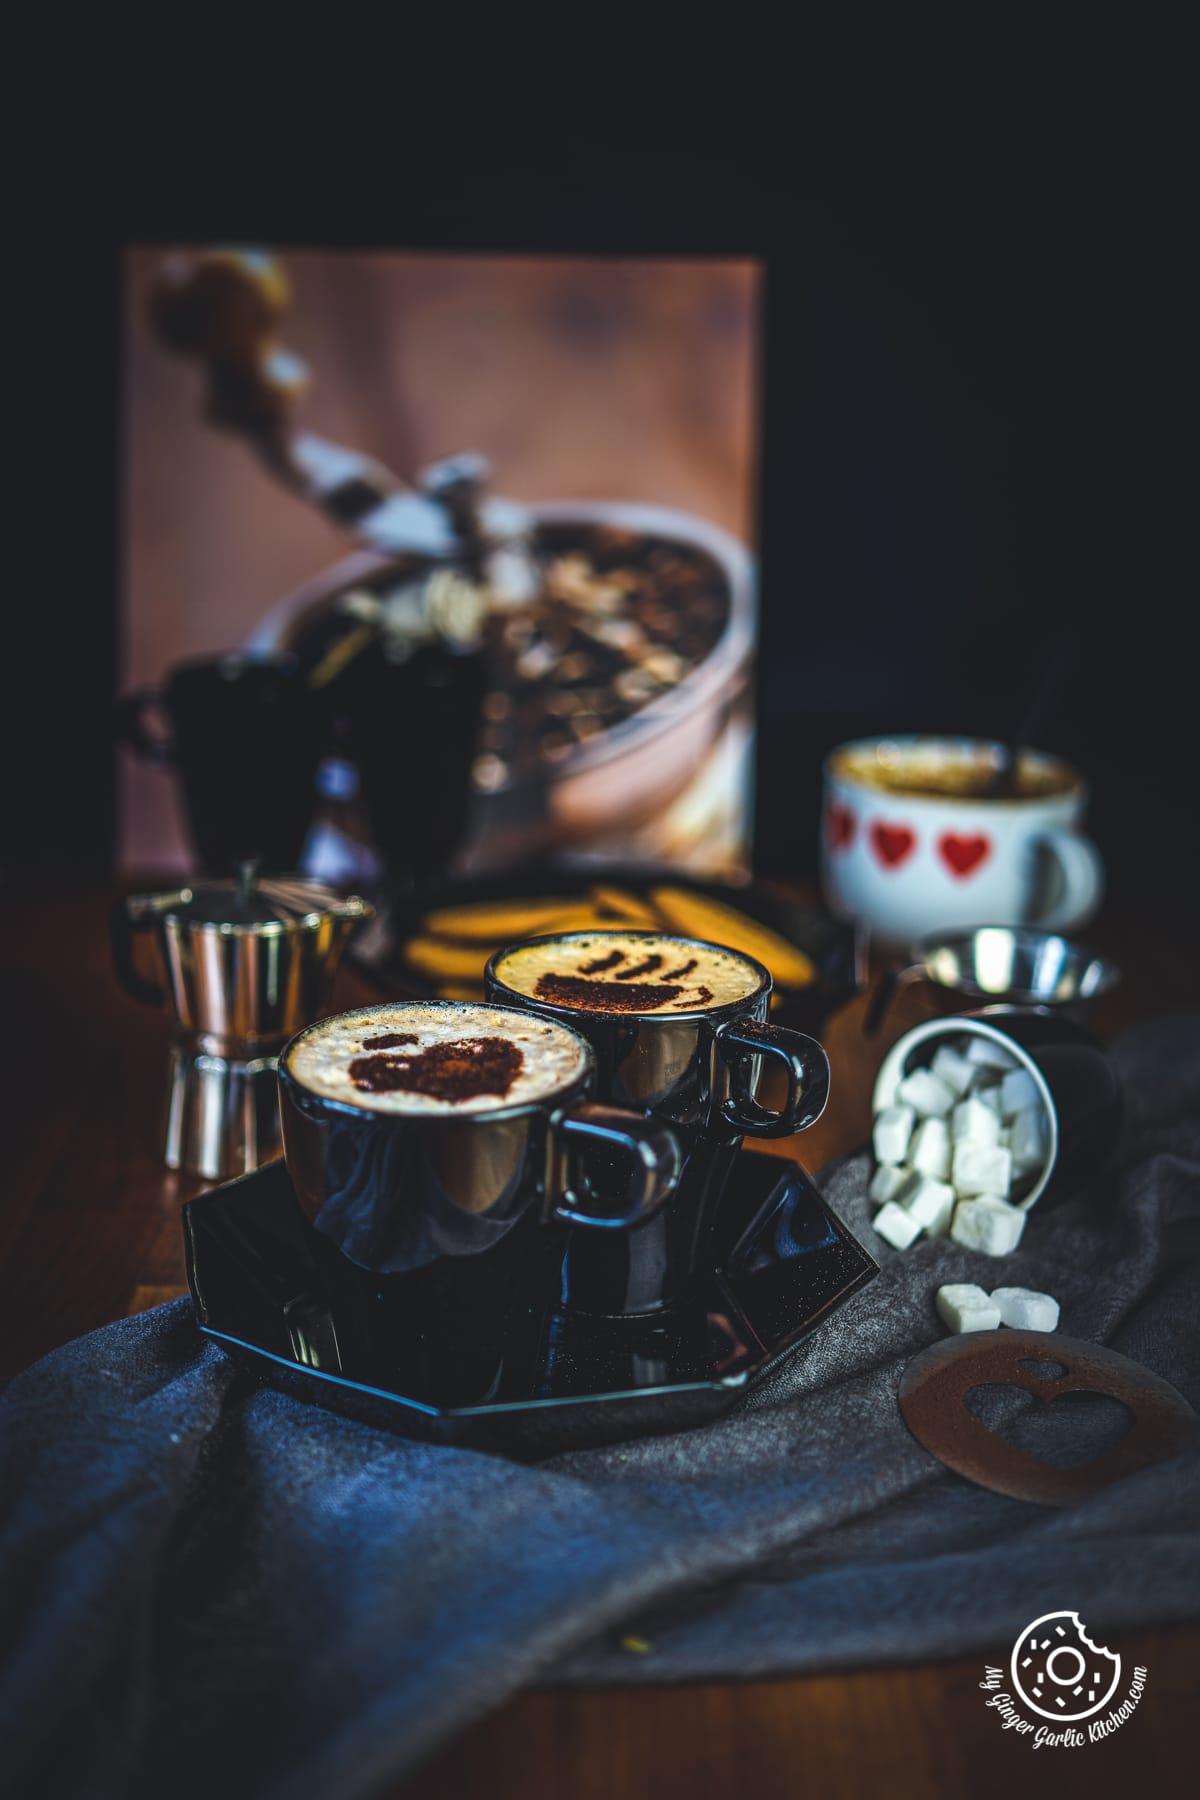 beaten coffee in black cups